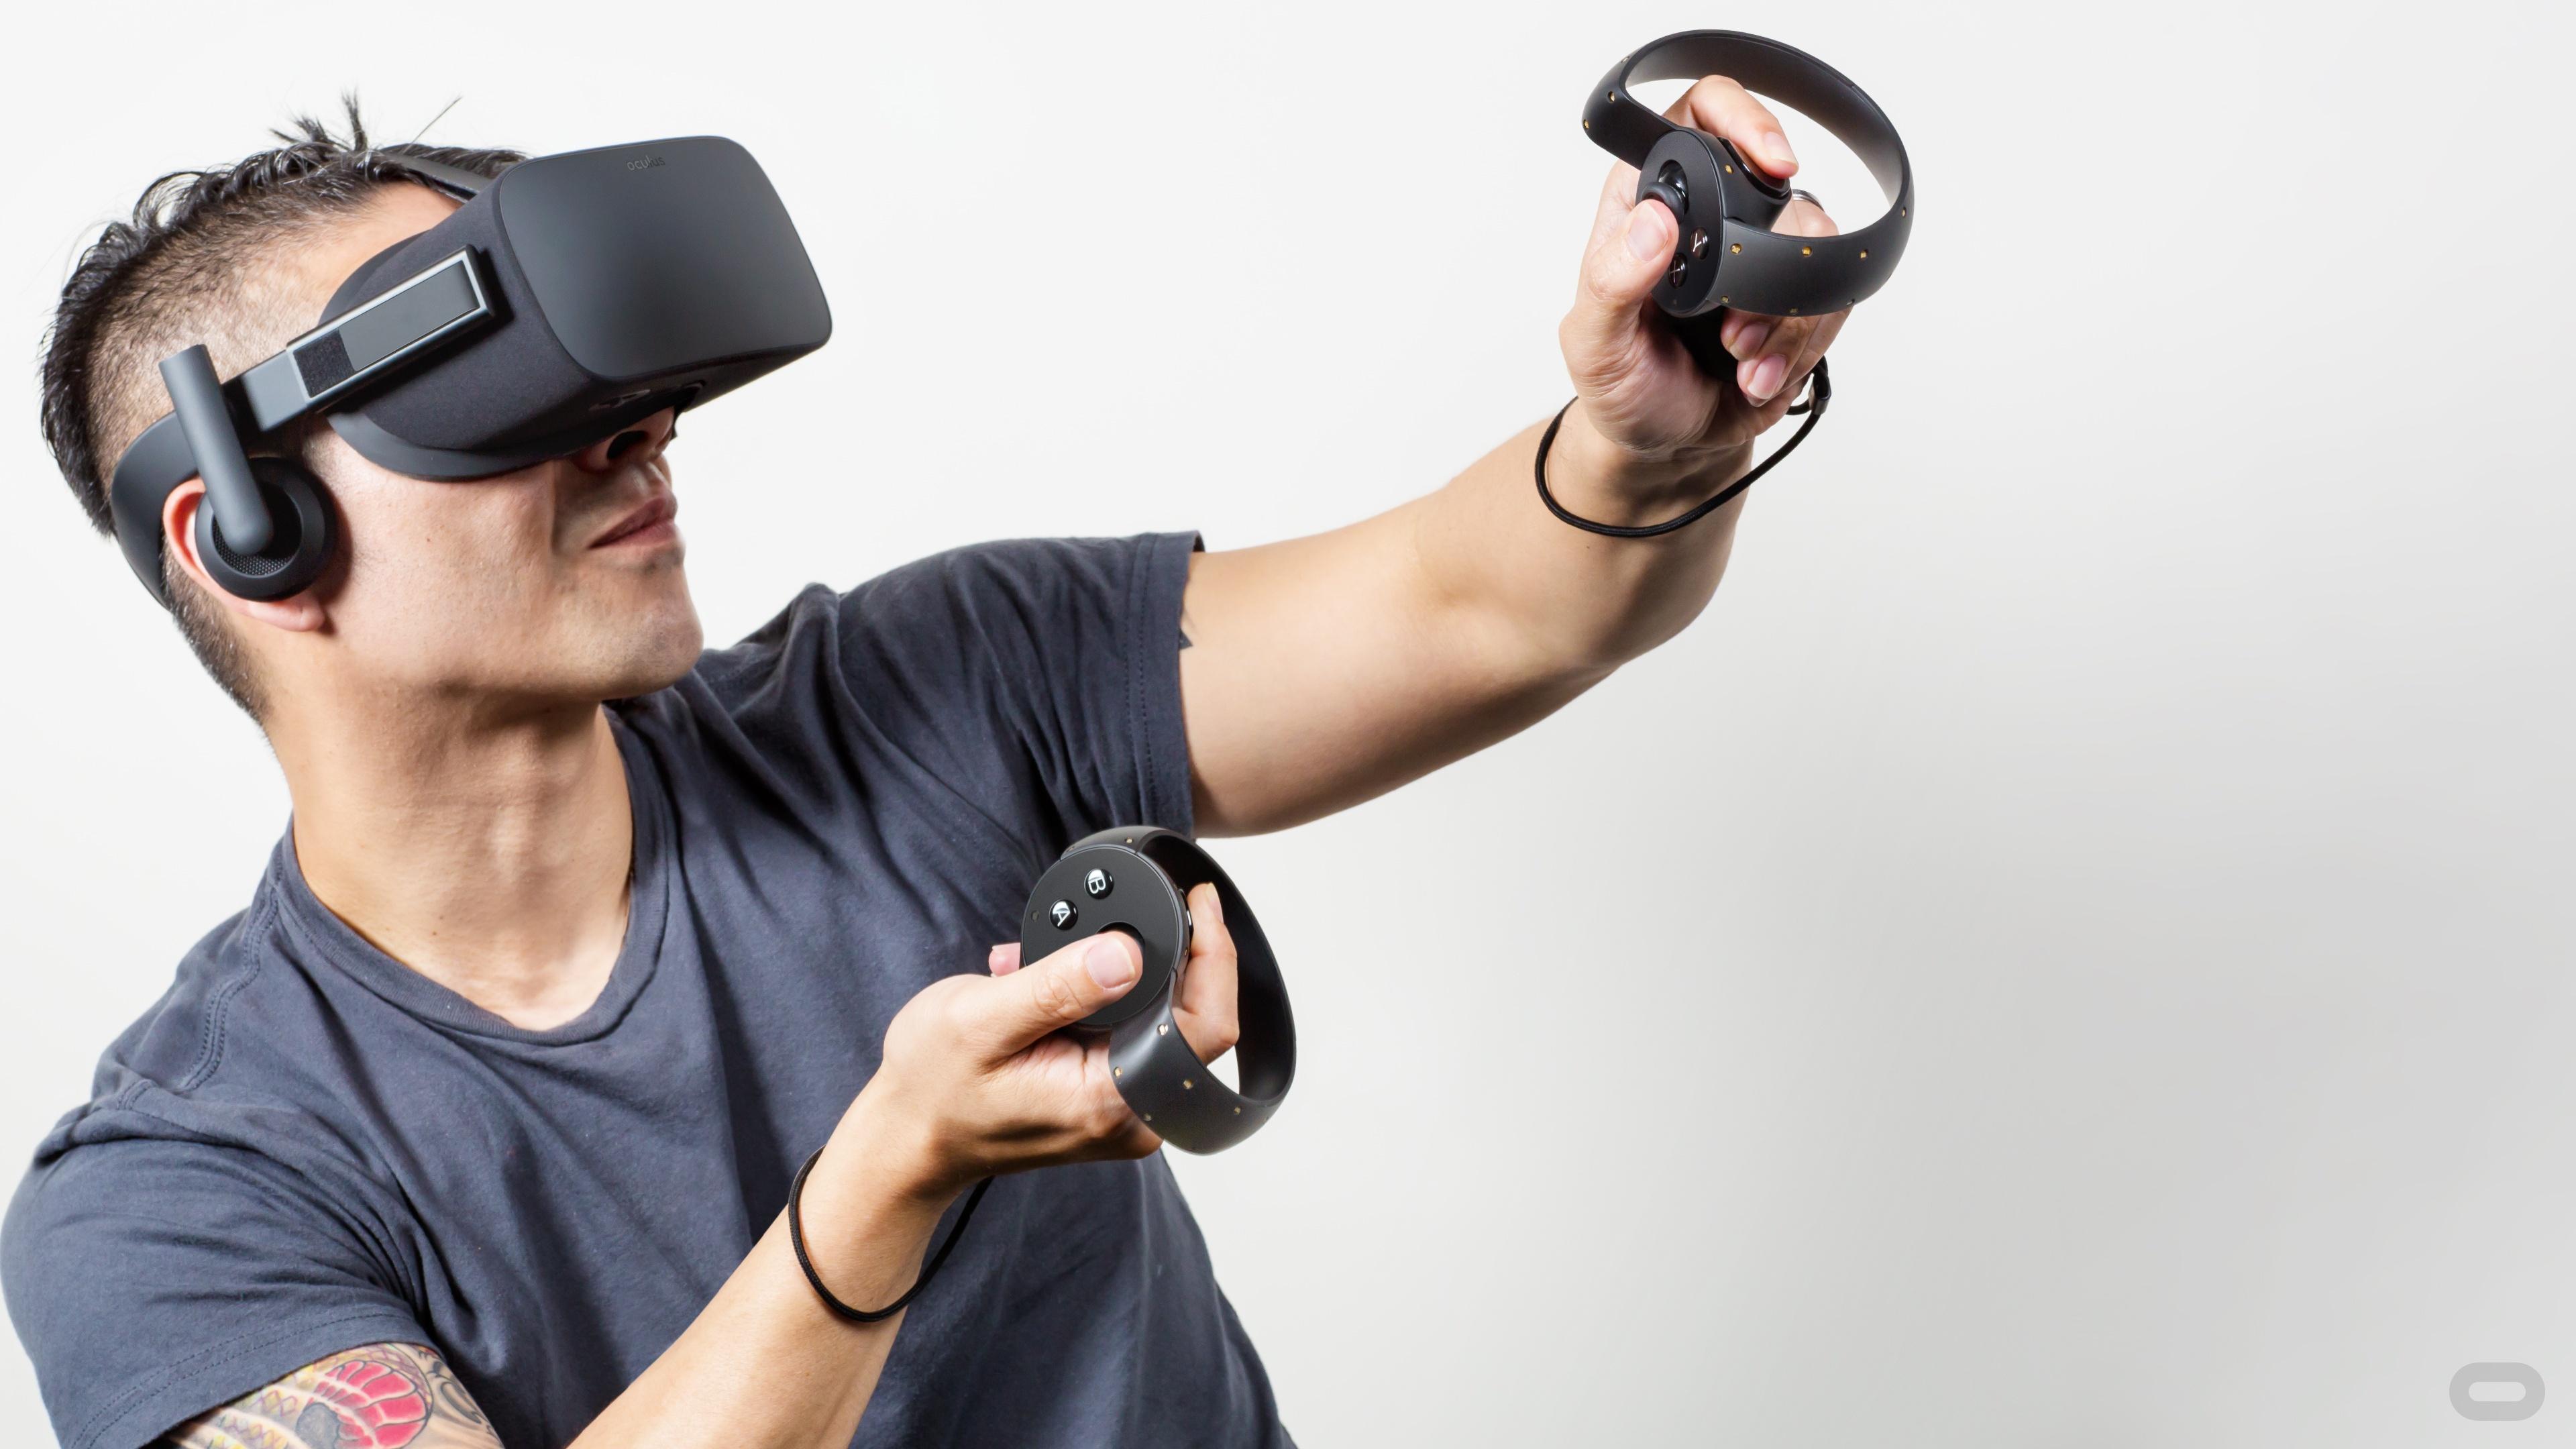 Oculus Winter Sale now on - Eve Valkyrie £7.99, Wilsons Heart £8.99, Arizona Sunshine £19.49